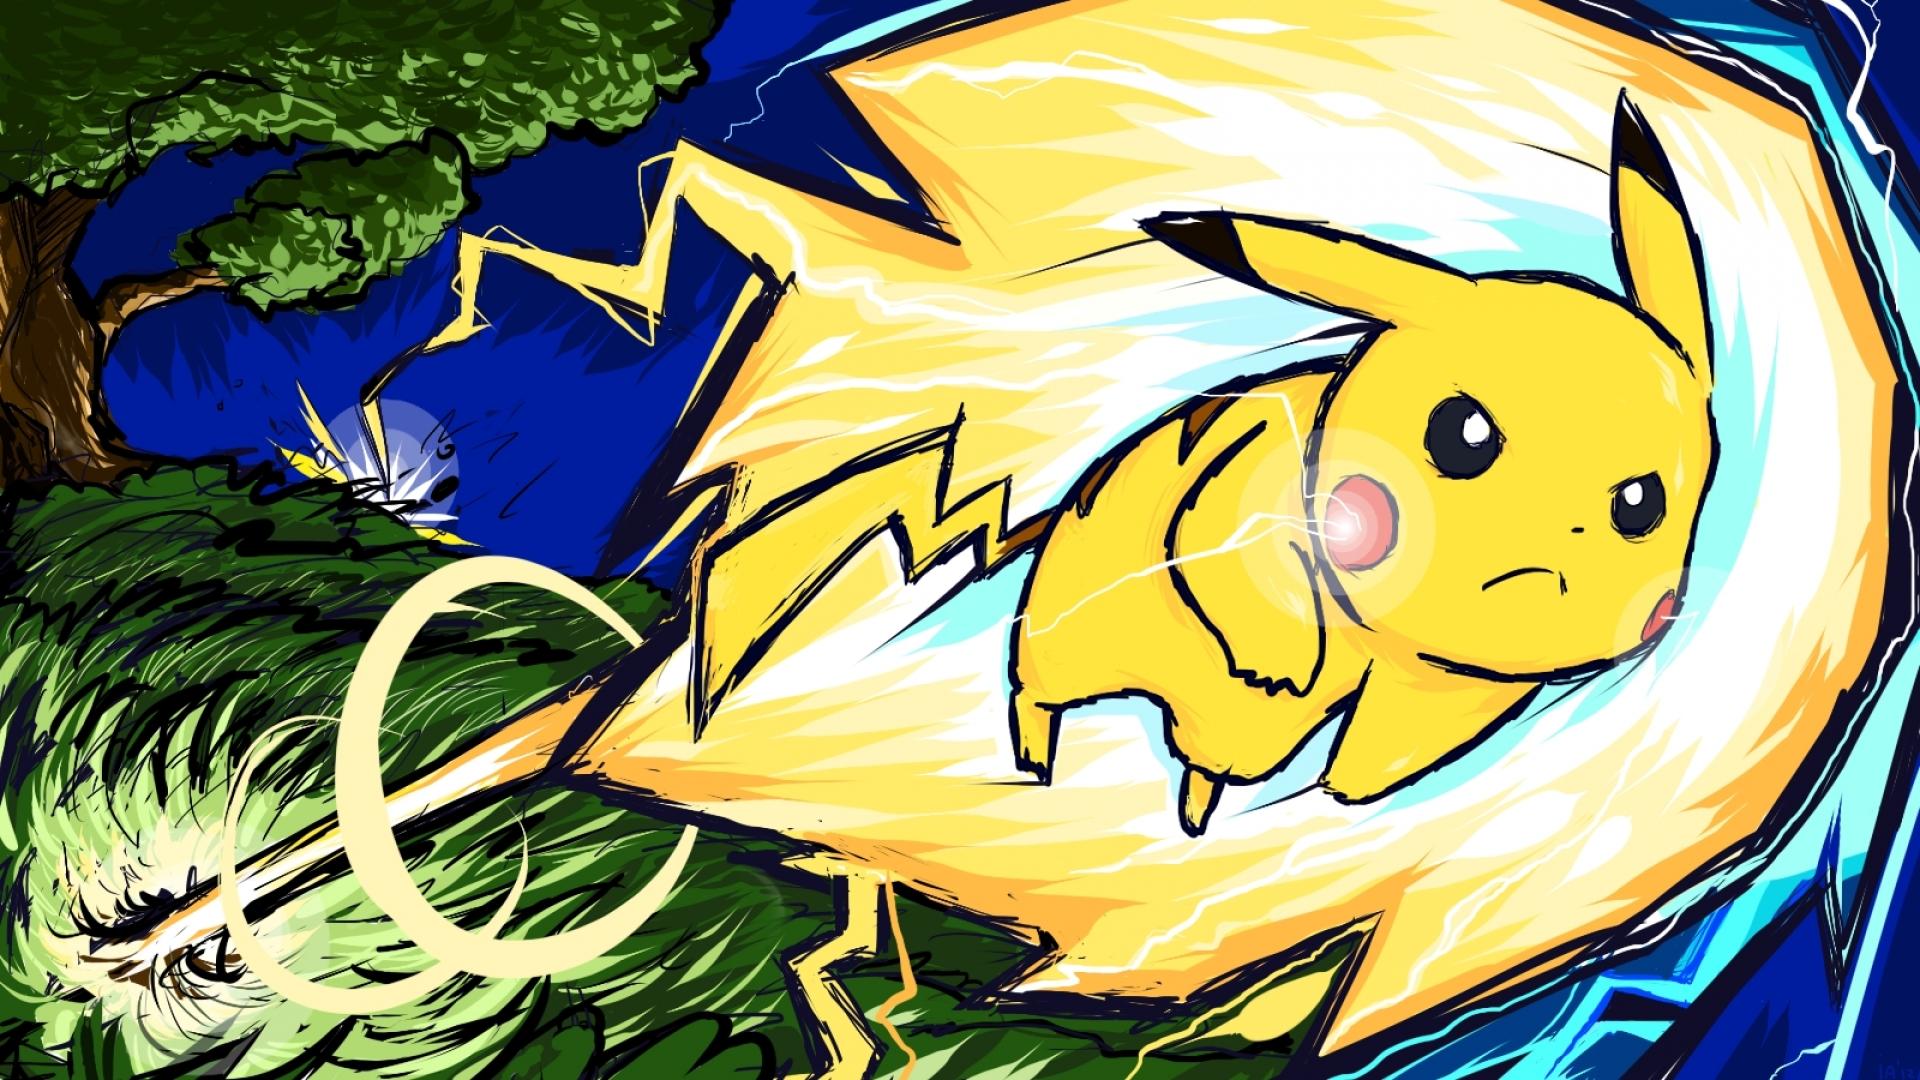 pikachu storm lightning pokemon blue pokemon red 1600x900 wallpaper 1920x1080